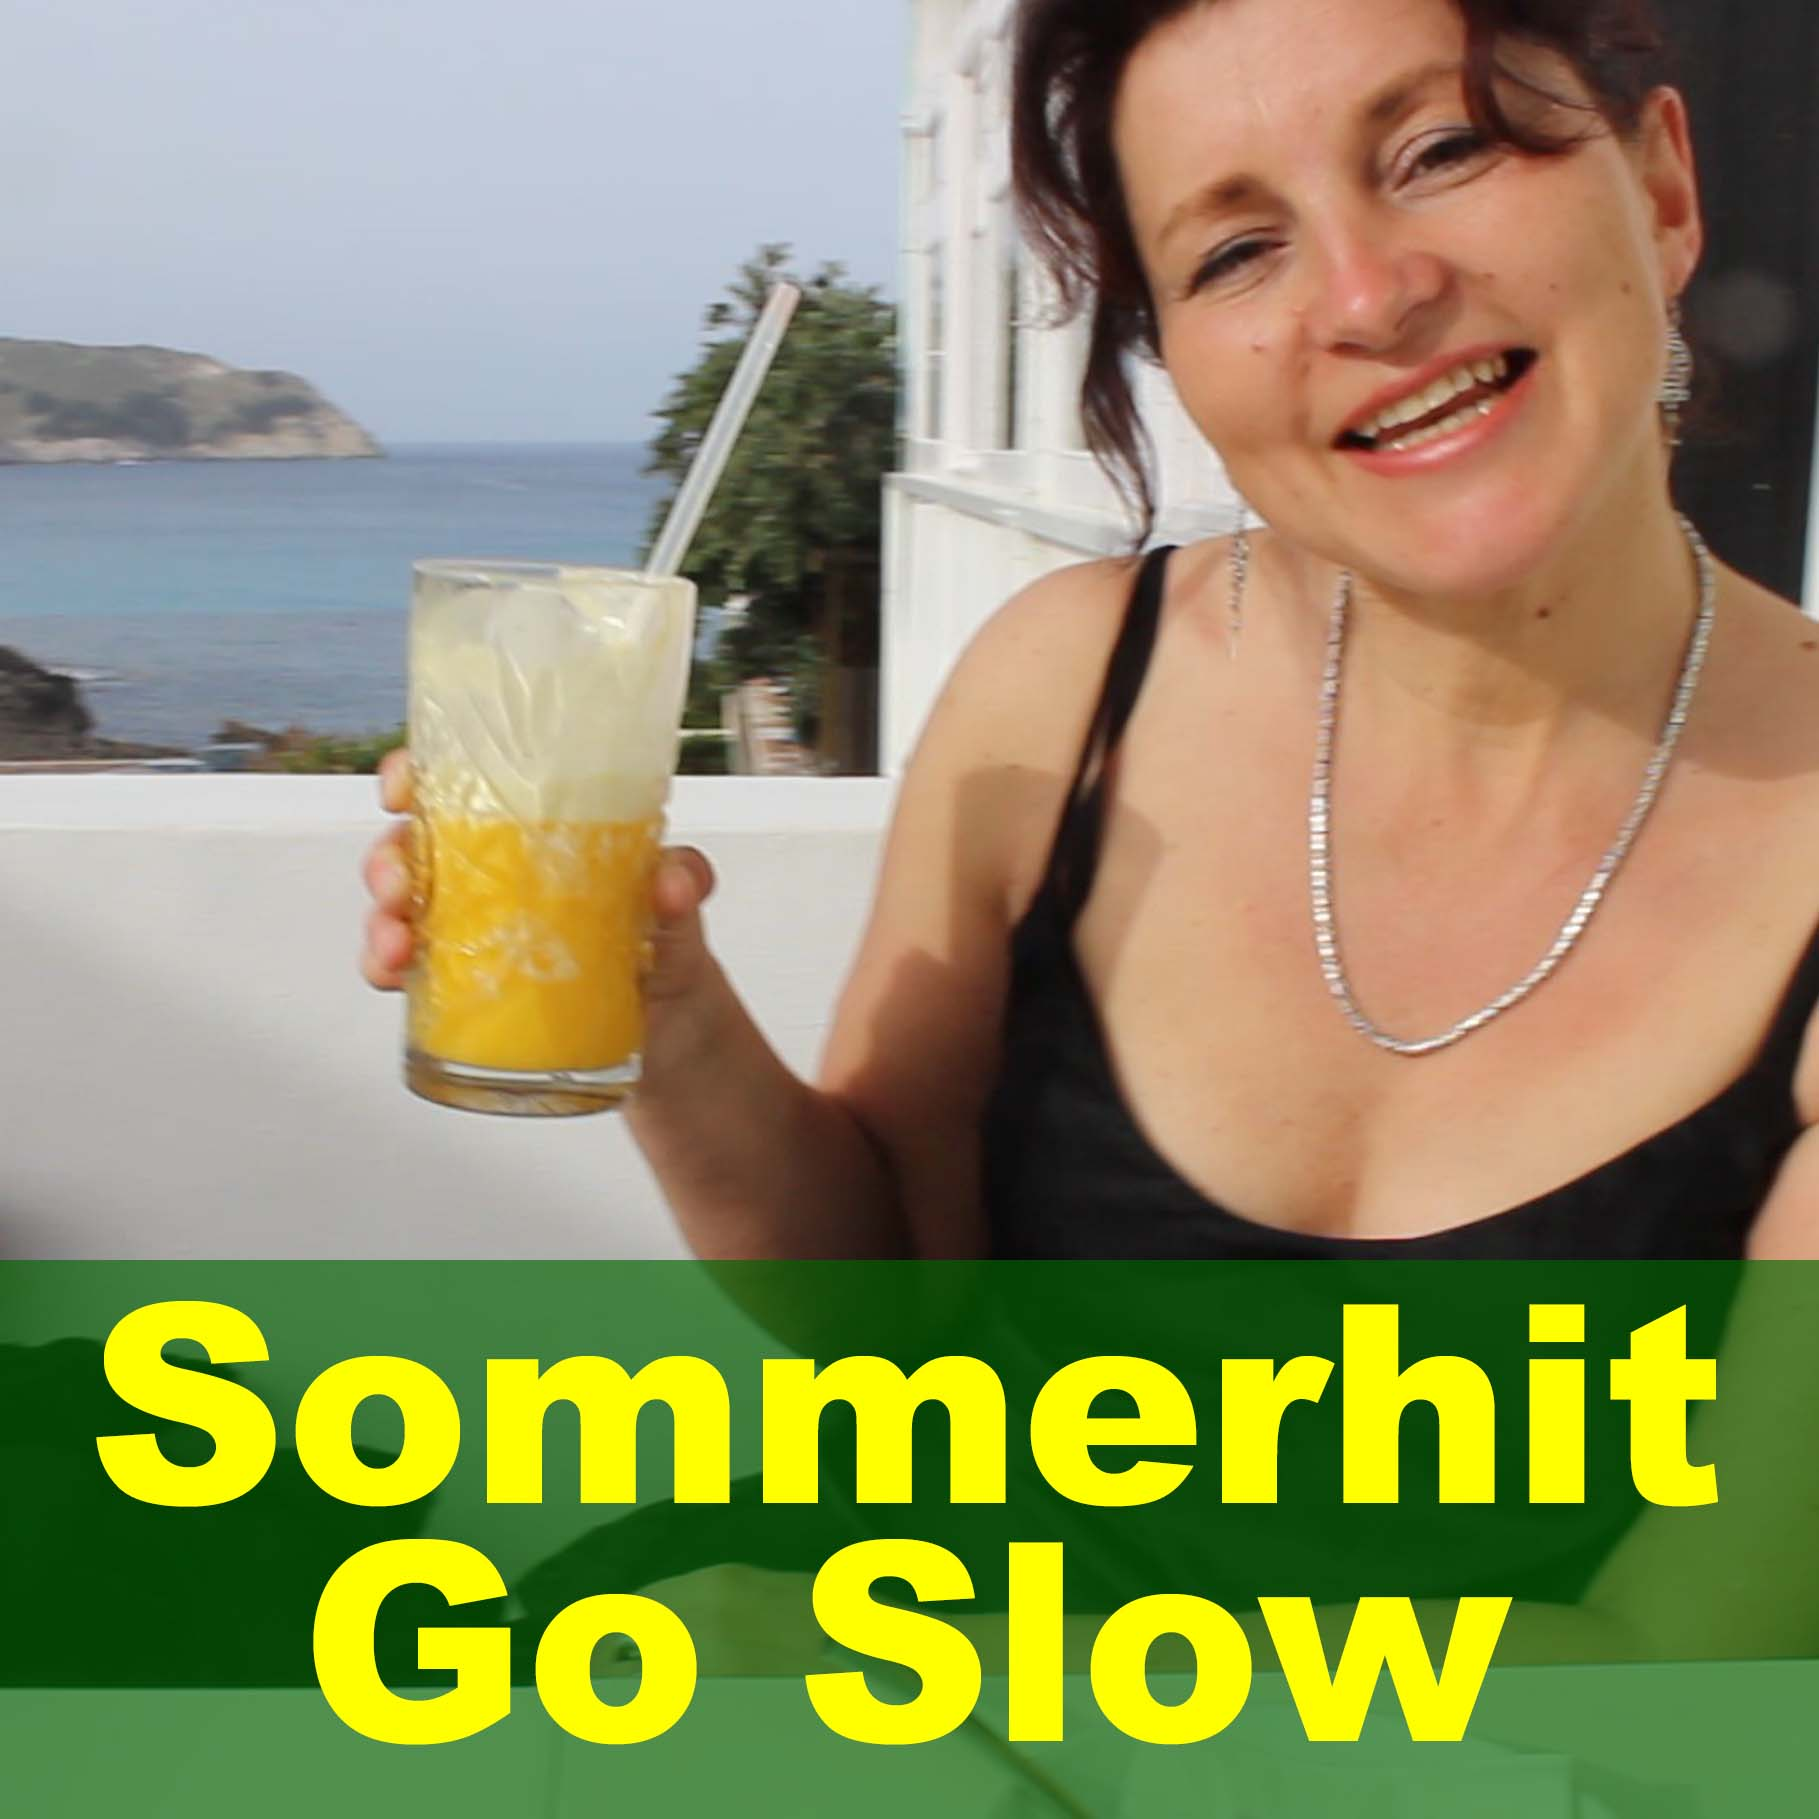 Sommerhit Go Slow